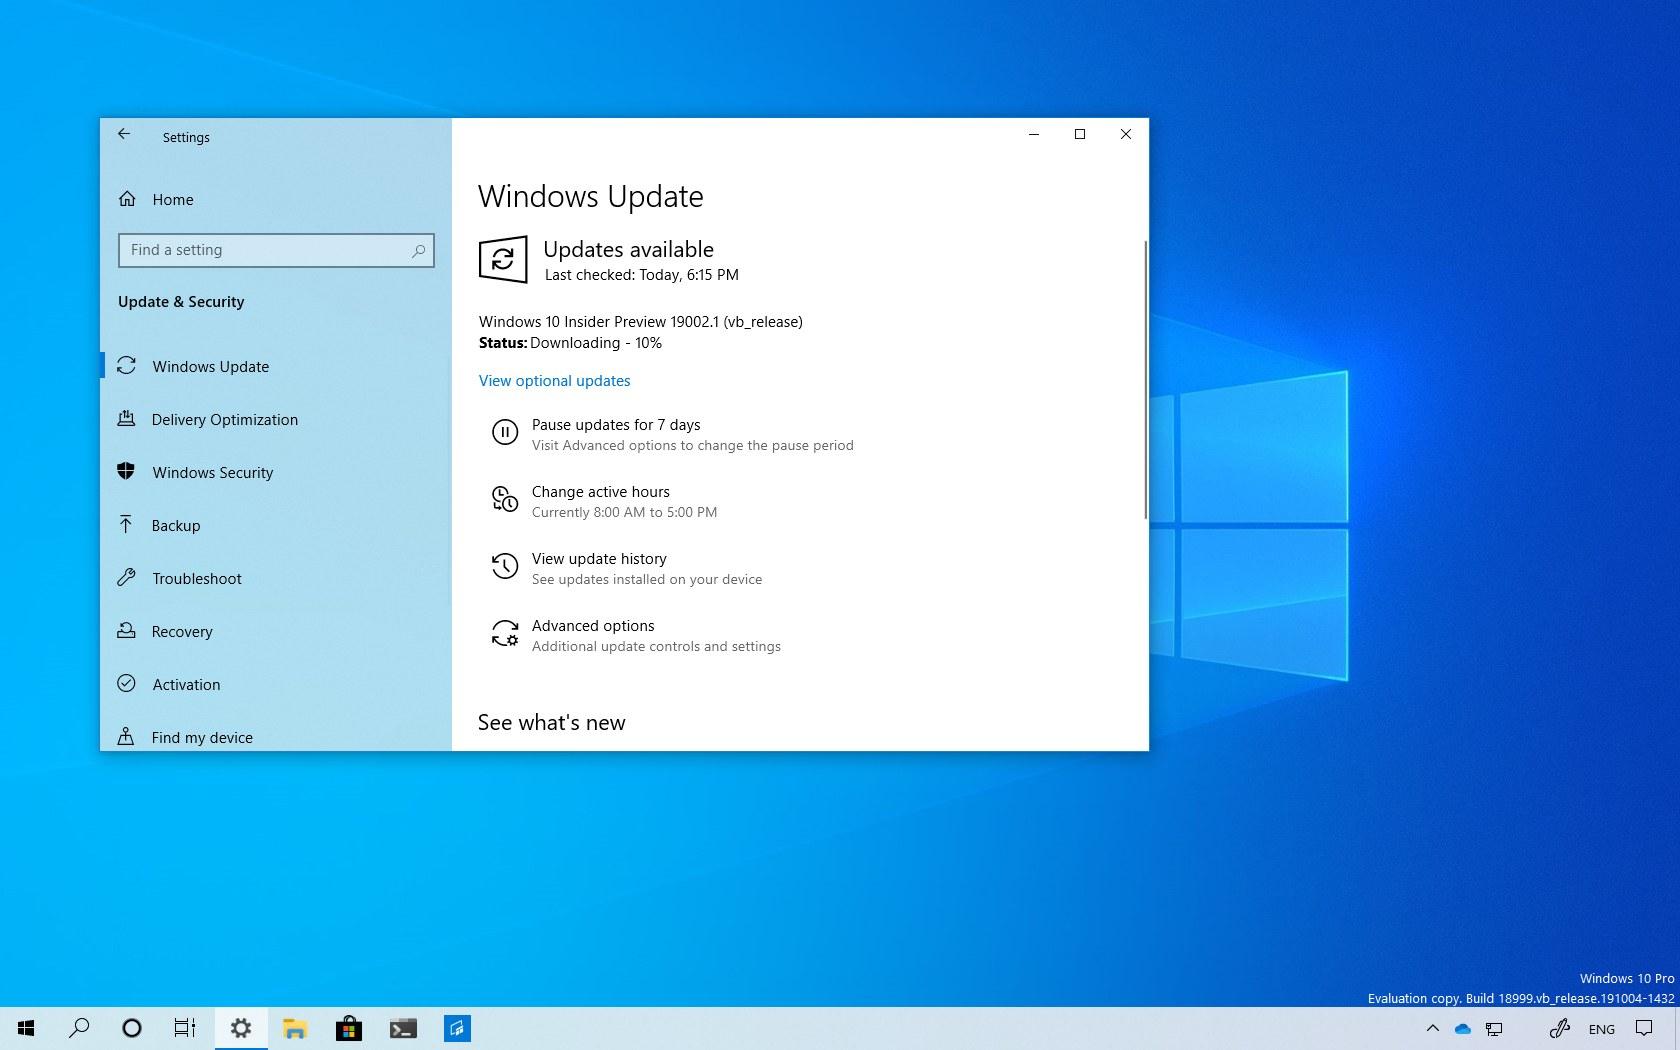 Windows 10 build 19002 download